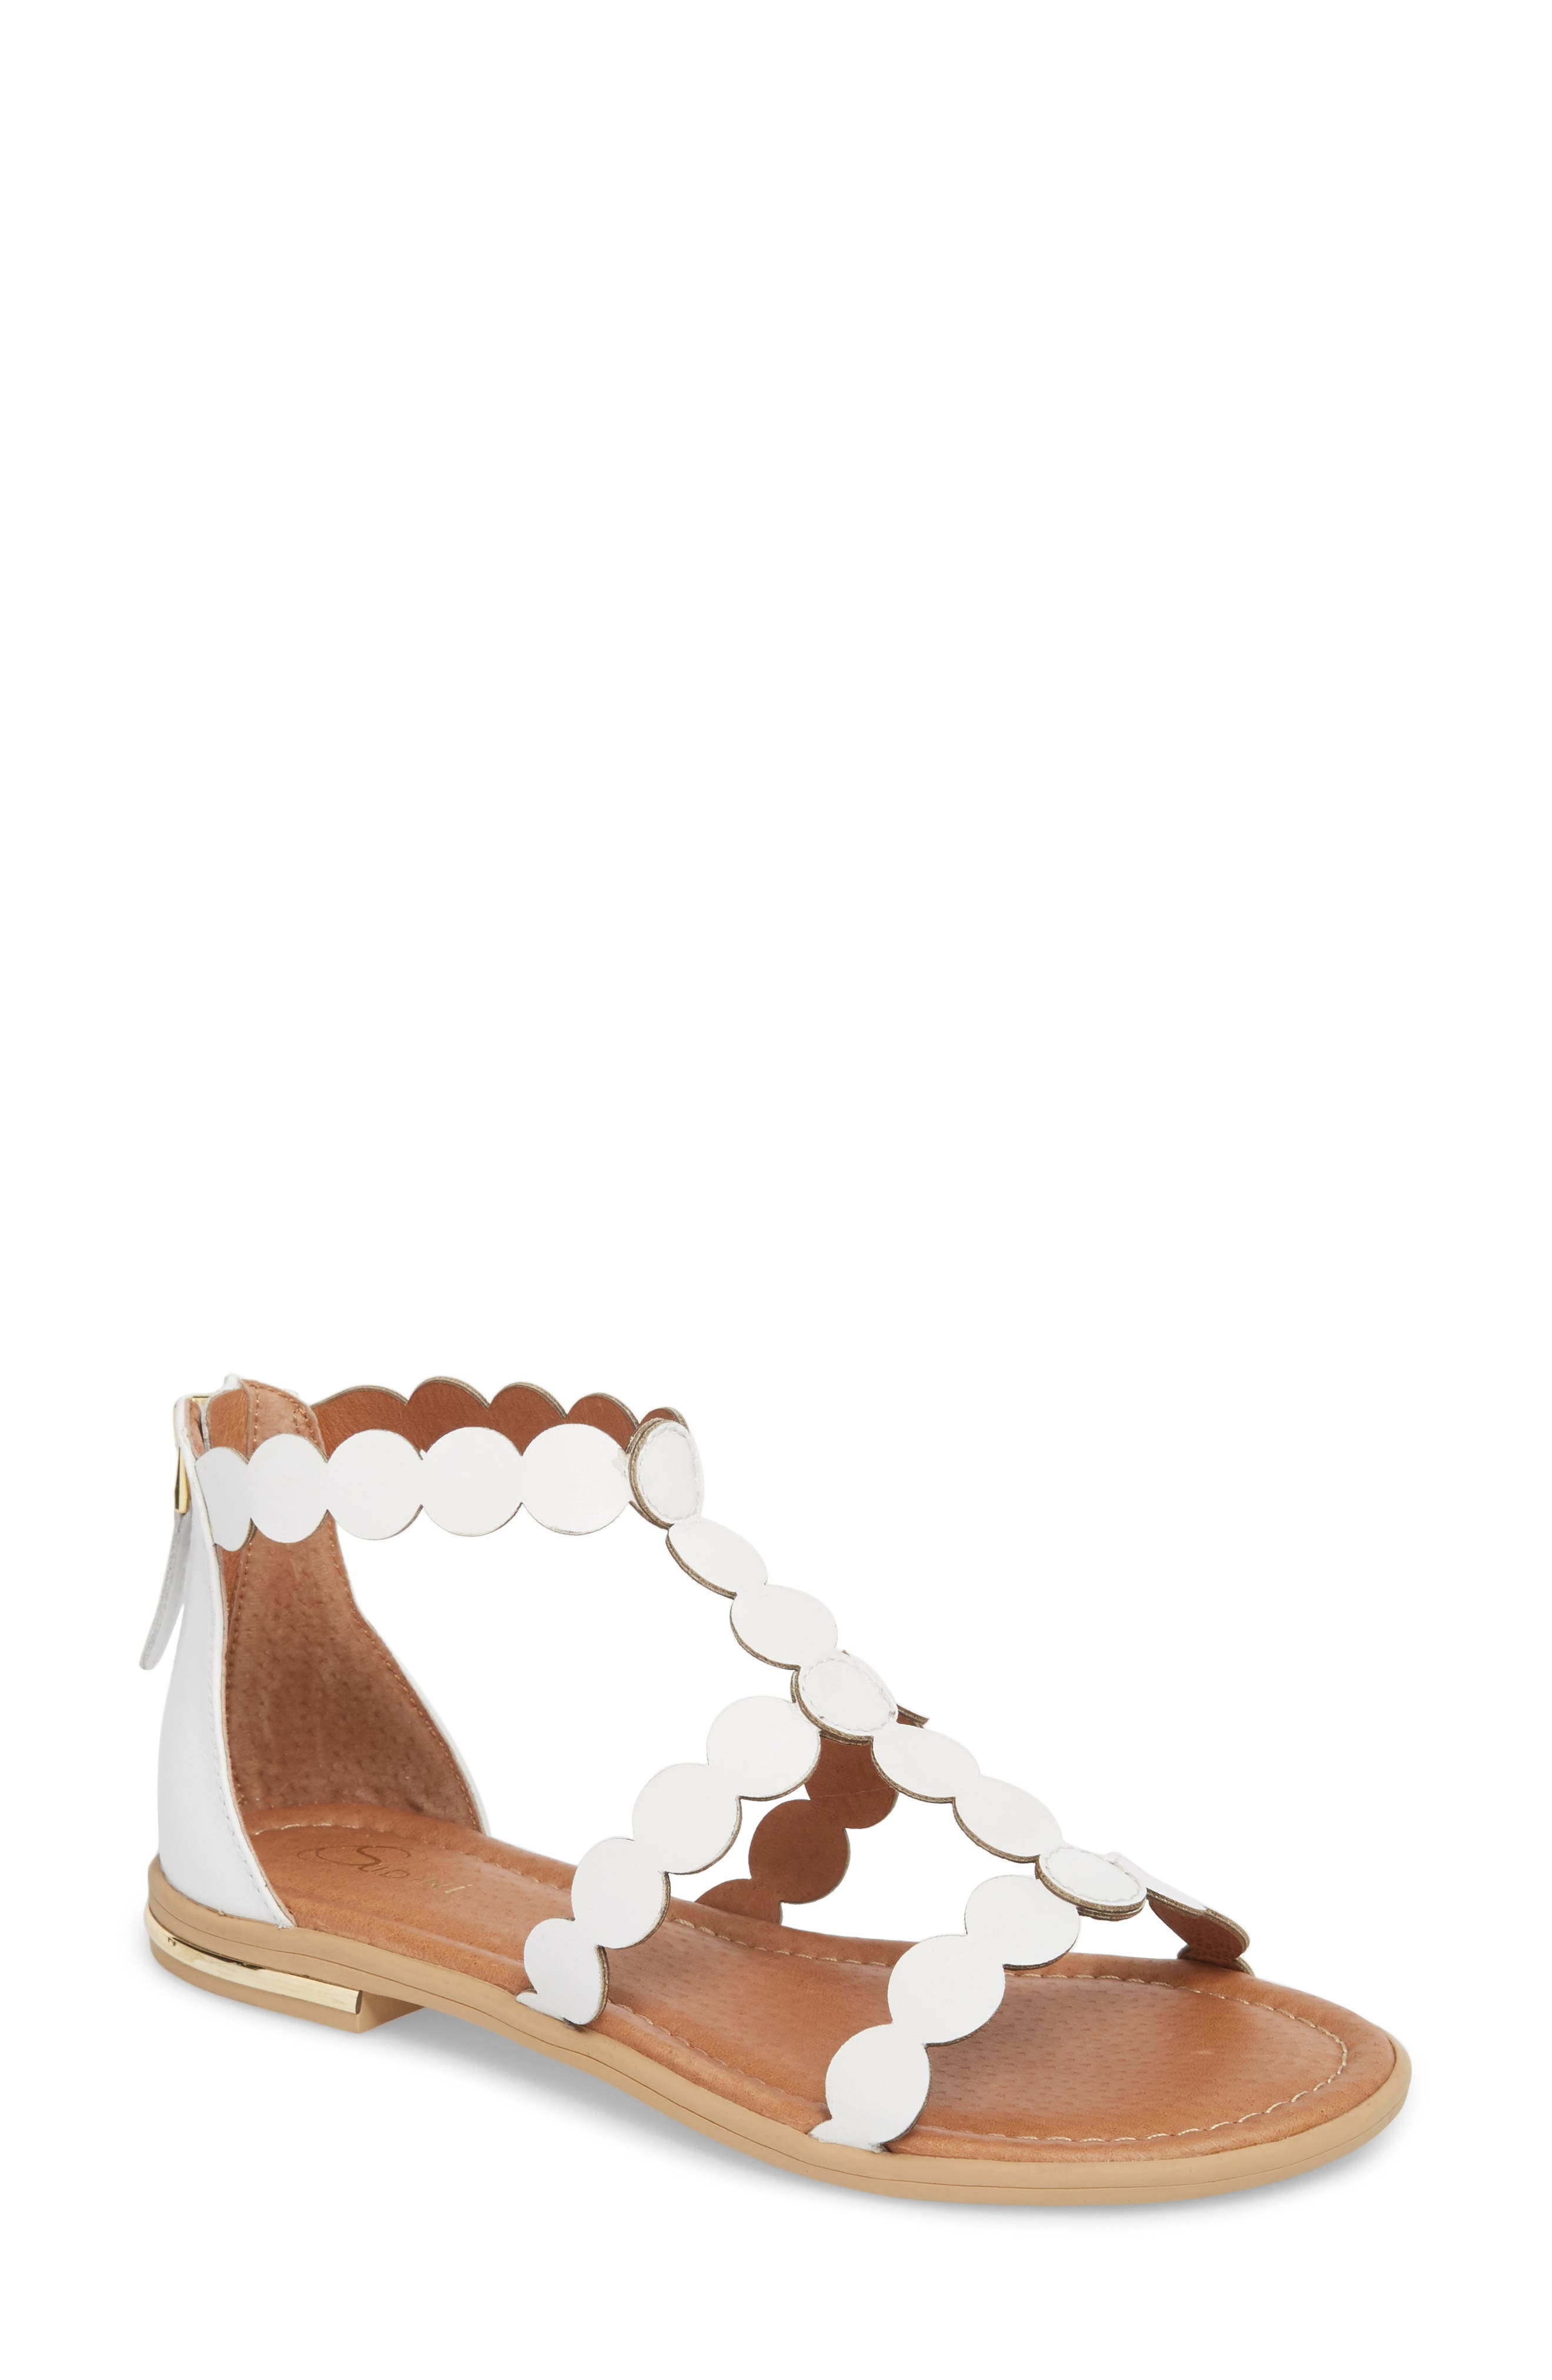 SUDINI Rovigo Sandal, Main, color, WHITE SUEDE